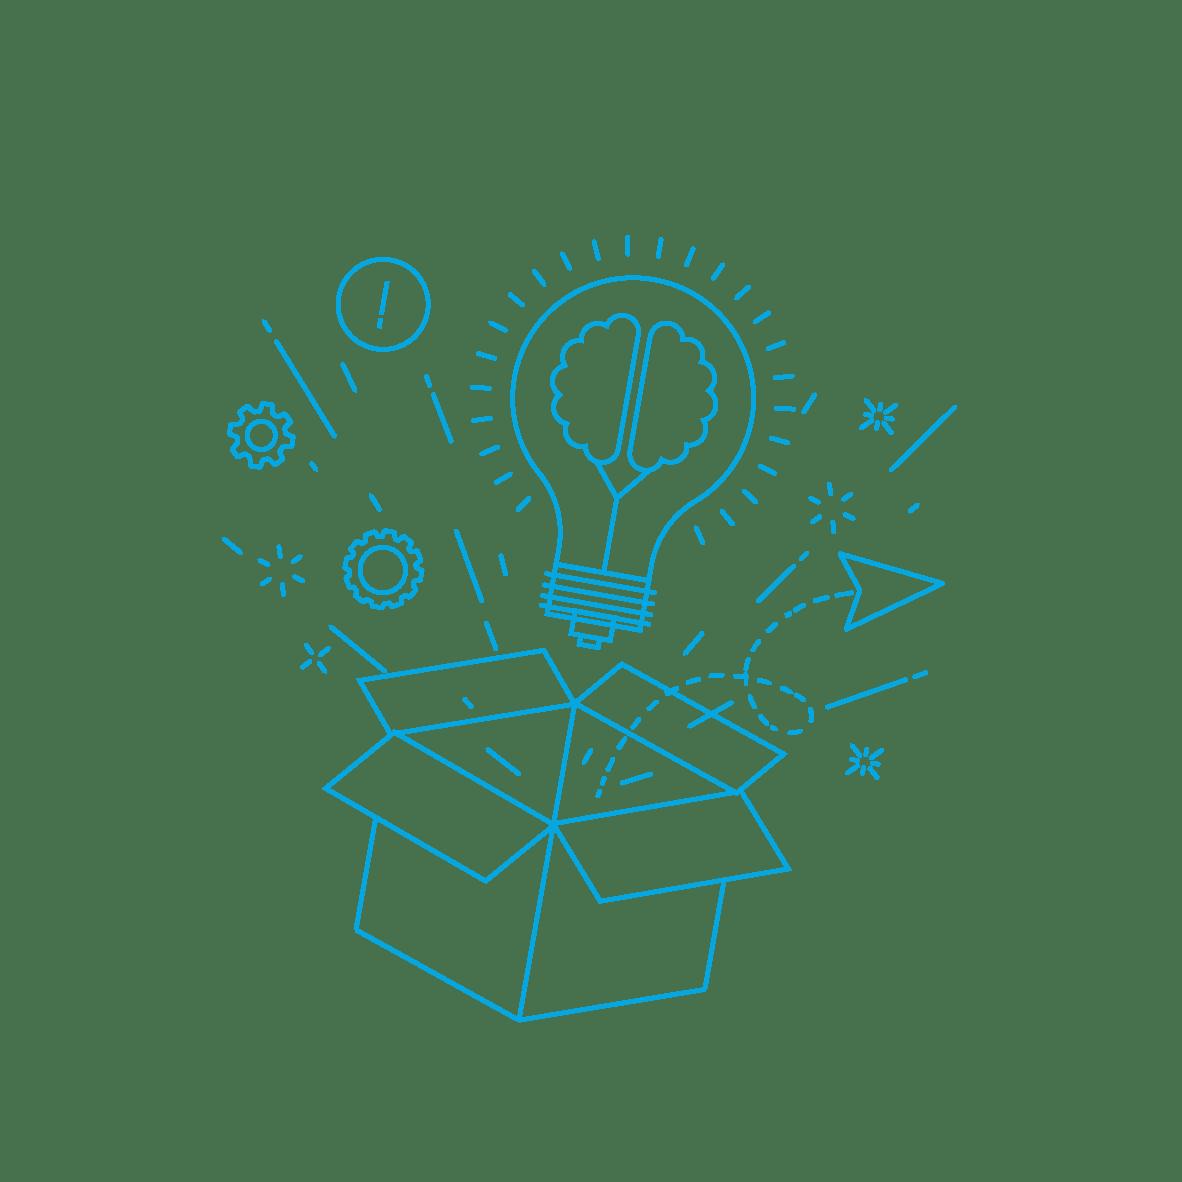 basic_illustrations-innovation.png